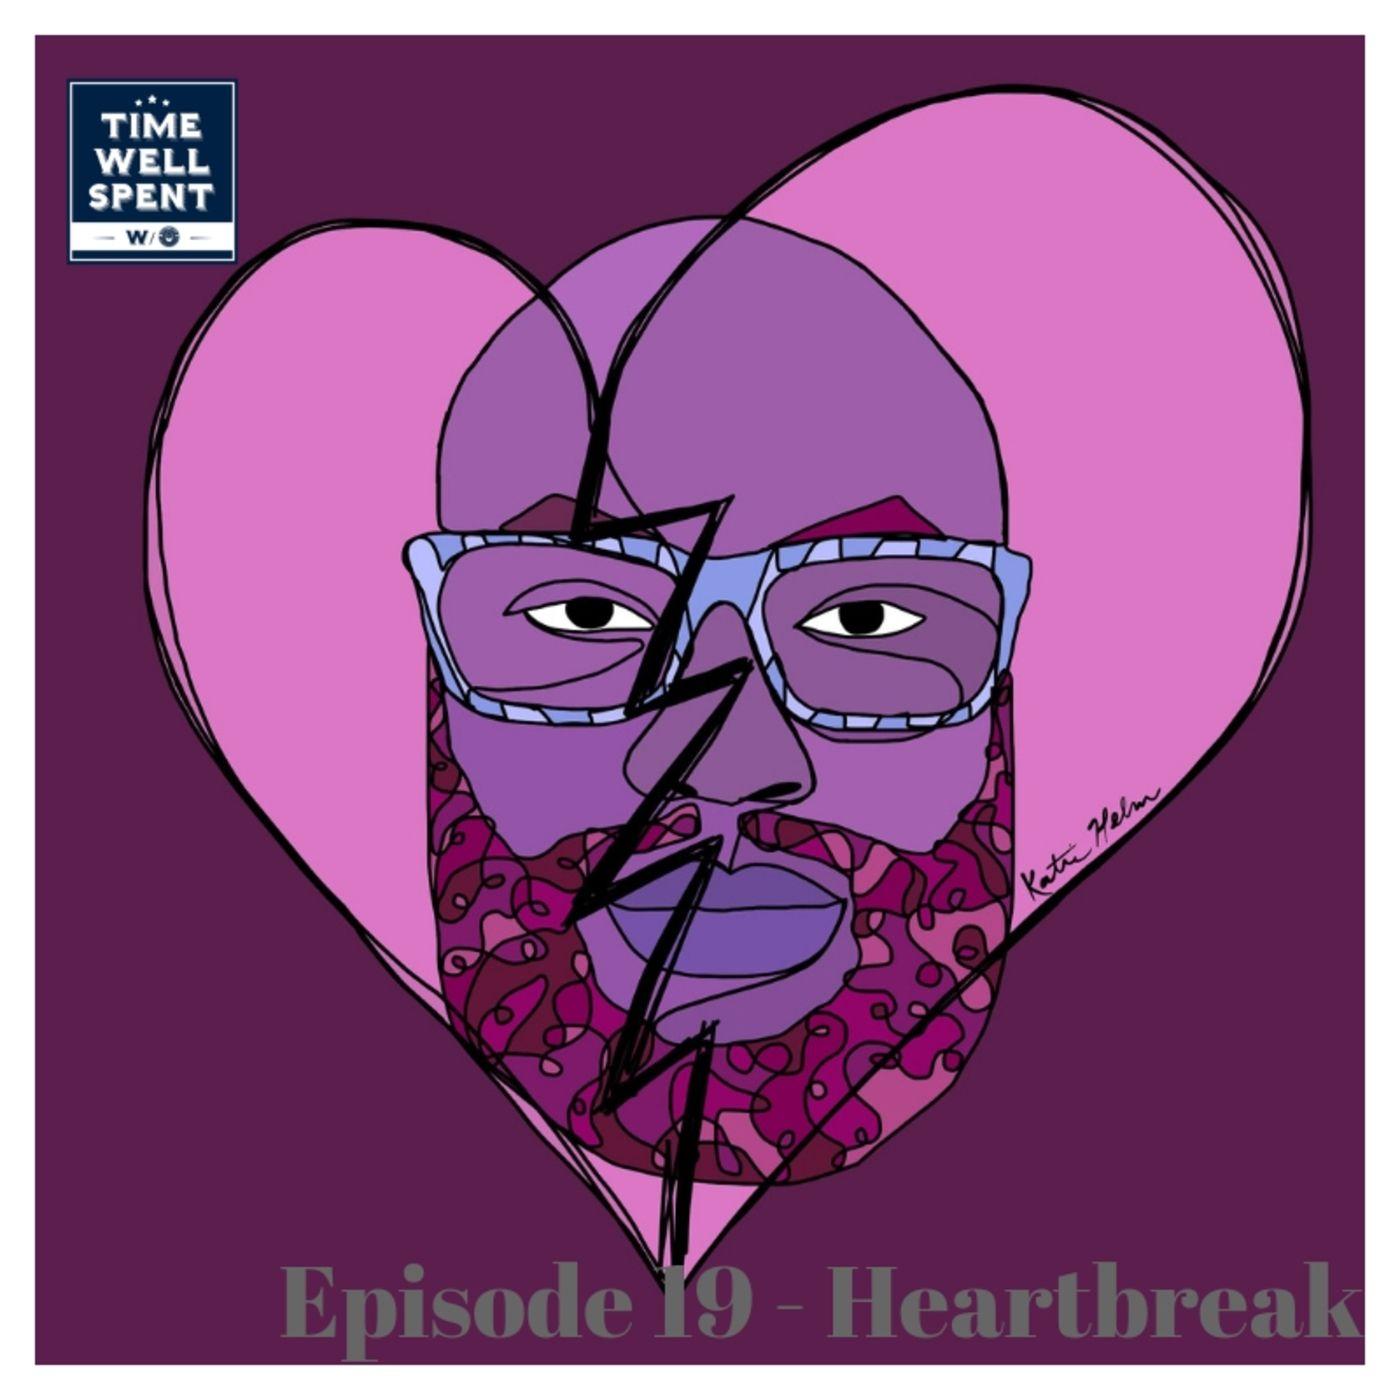 Episode 19 - Heartbreak